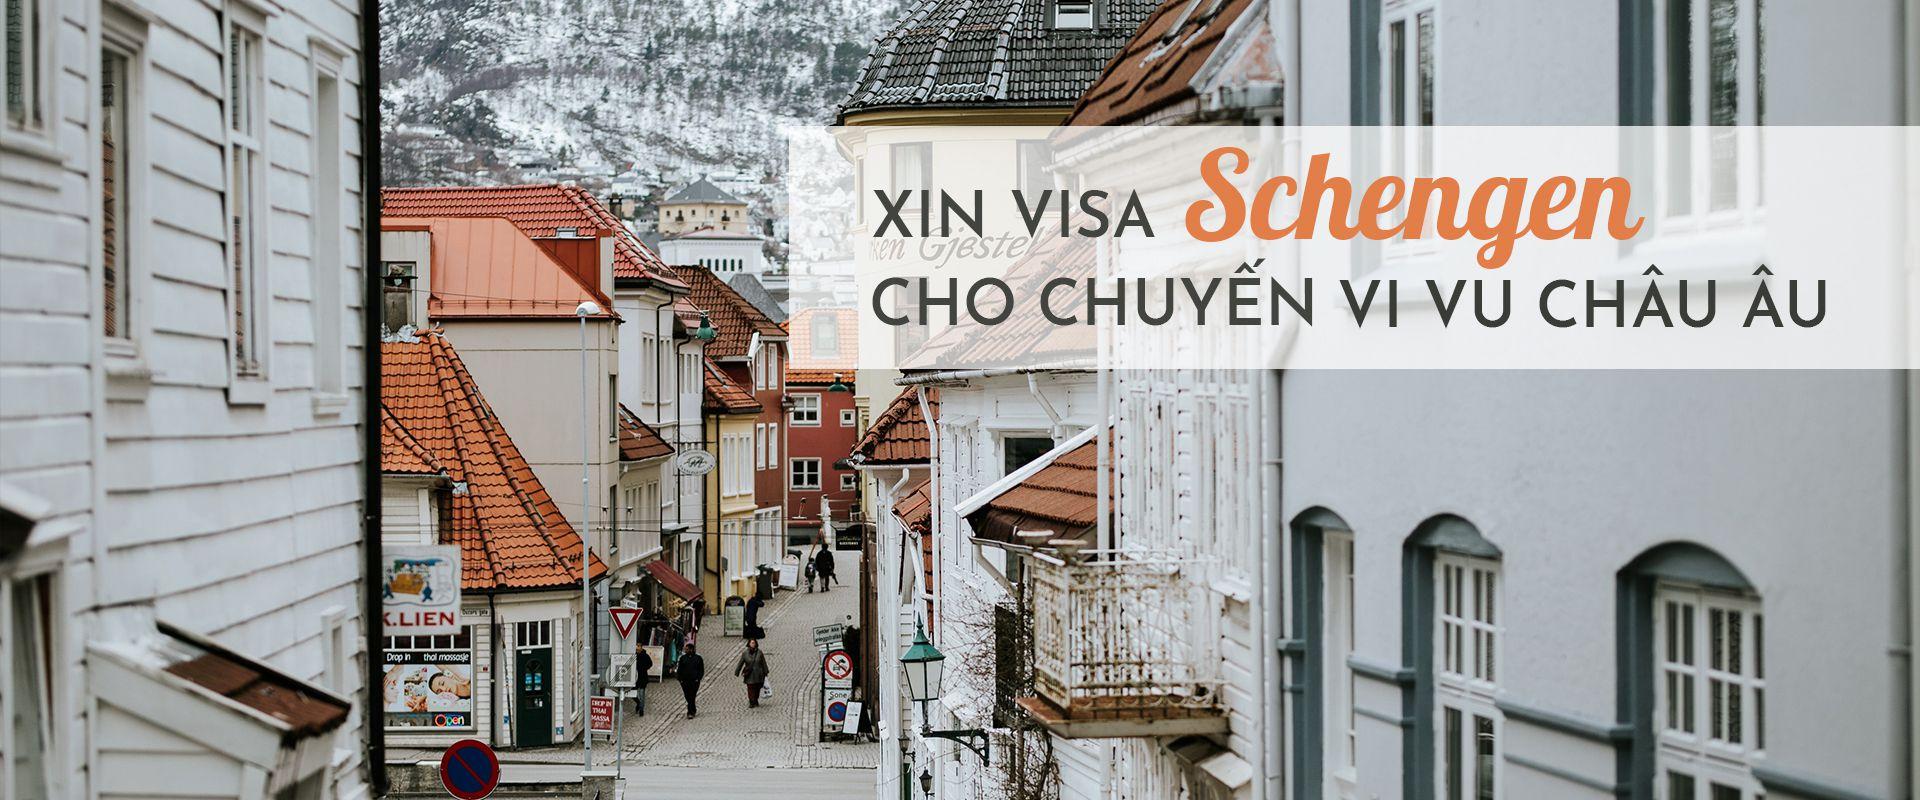 Kinh nghiệm xin visa Schengen 2019